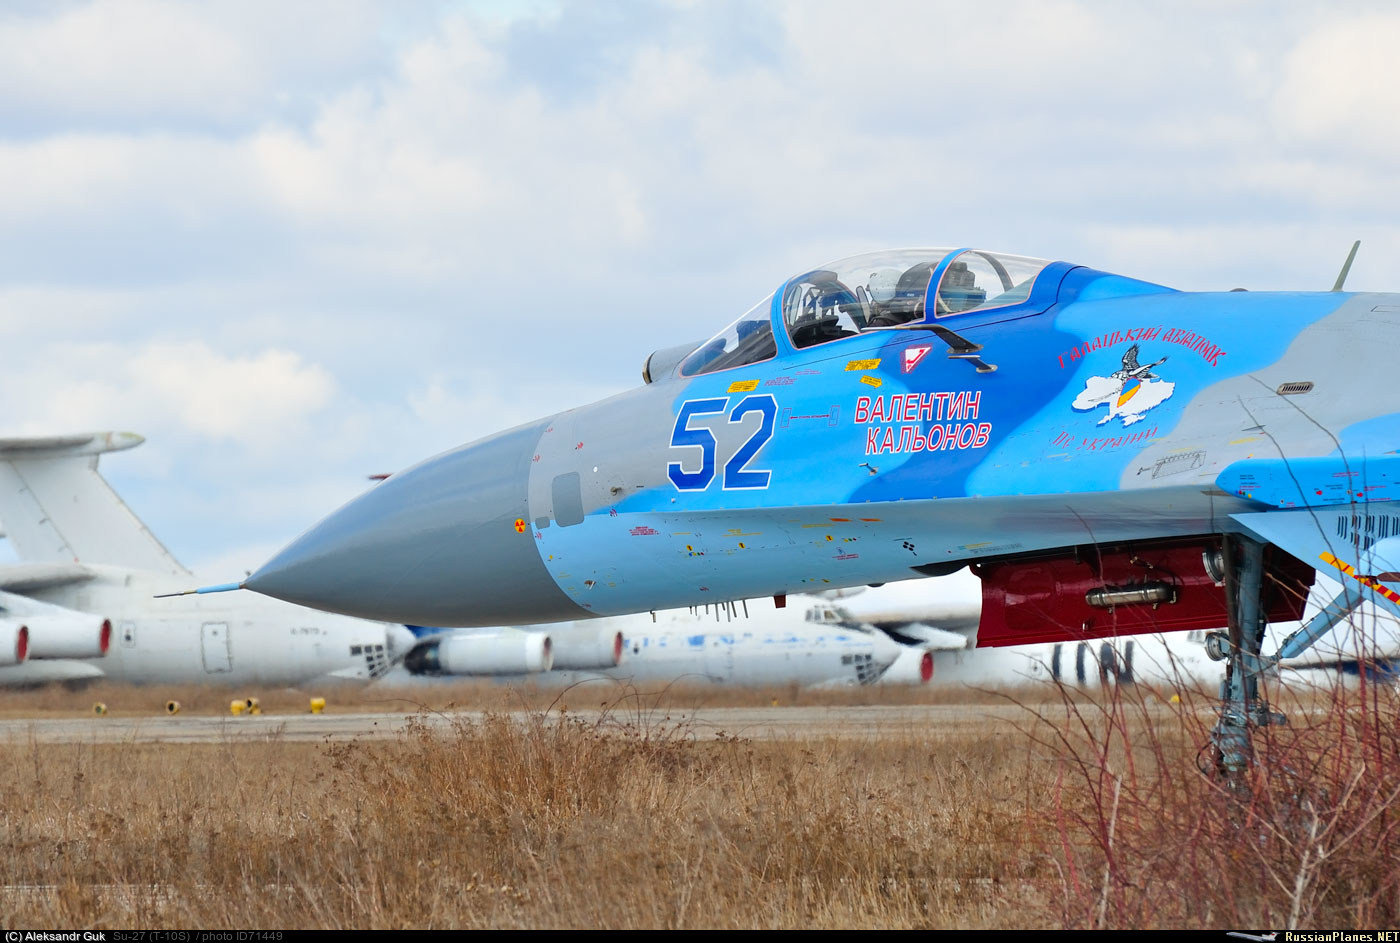 Ukrainian Armed Forces / Zbroyni Syly Ukrayiny - Page 3 071449